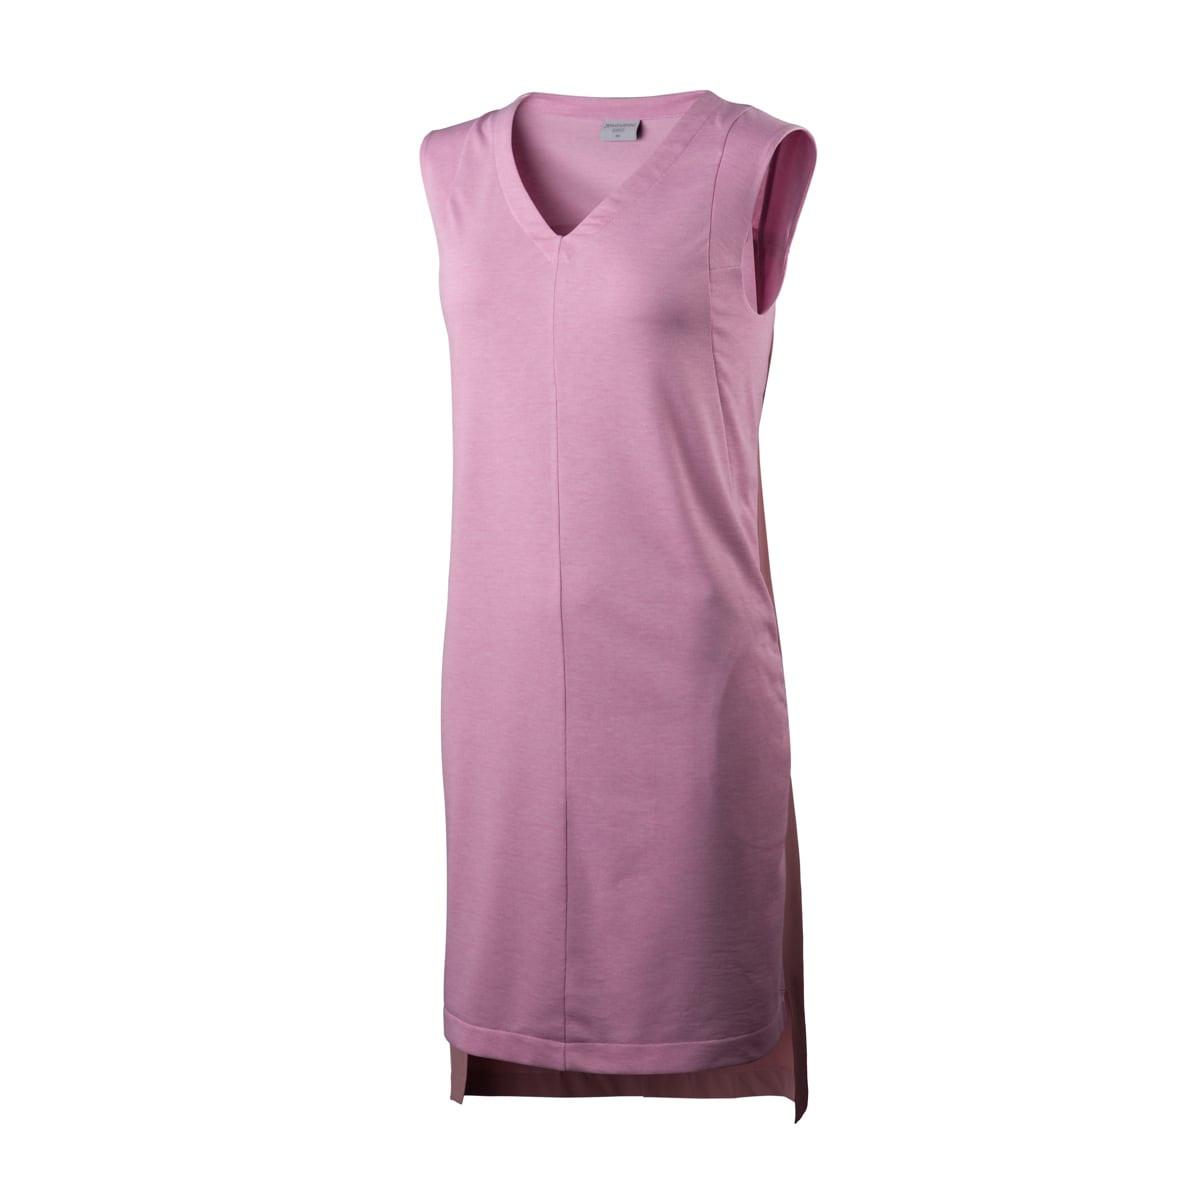 91a83b7f Houdini W's Ooh (Out Of Here) Dress De Lila | Fjellsport.no